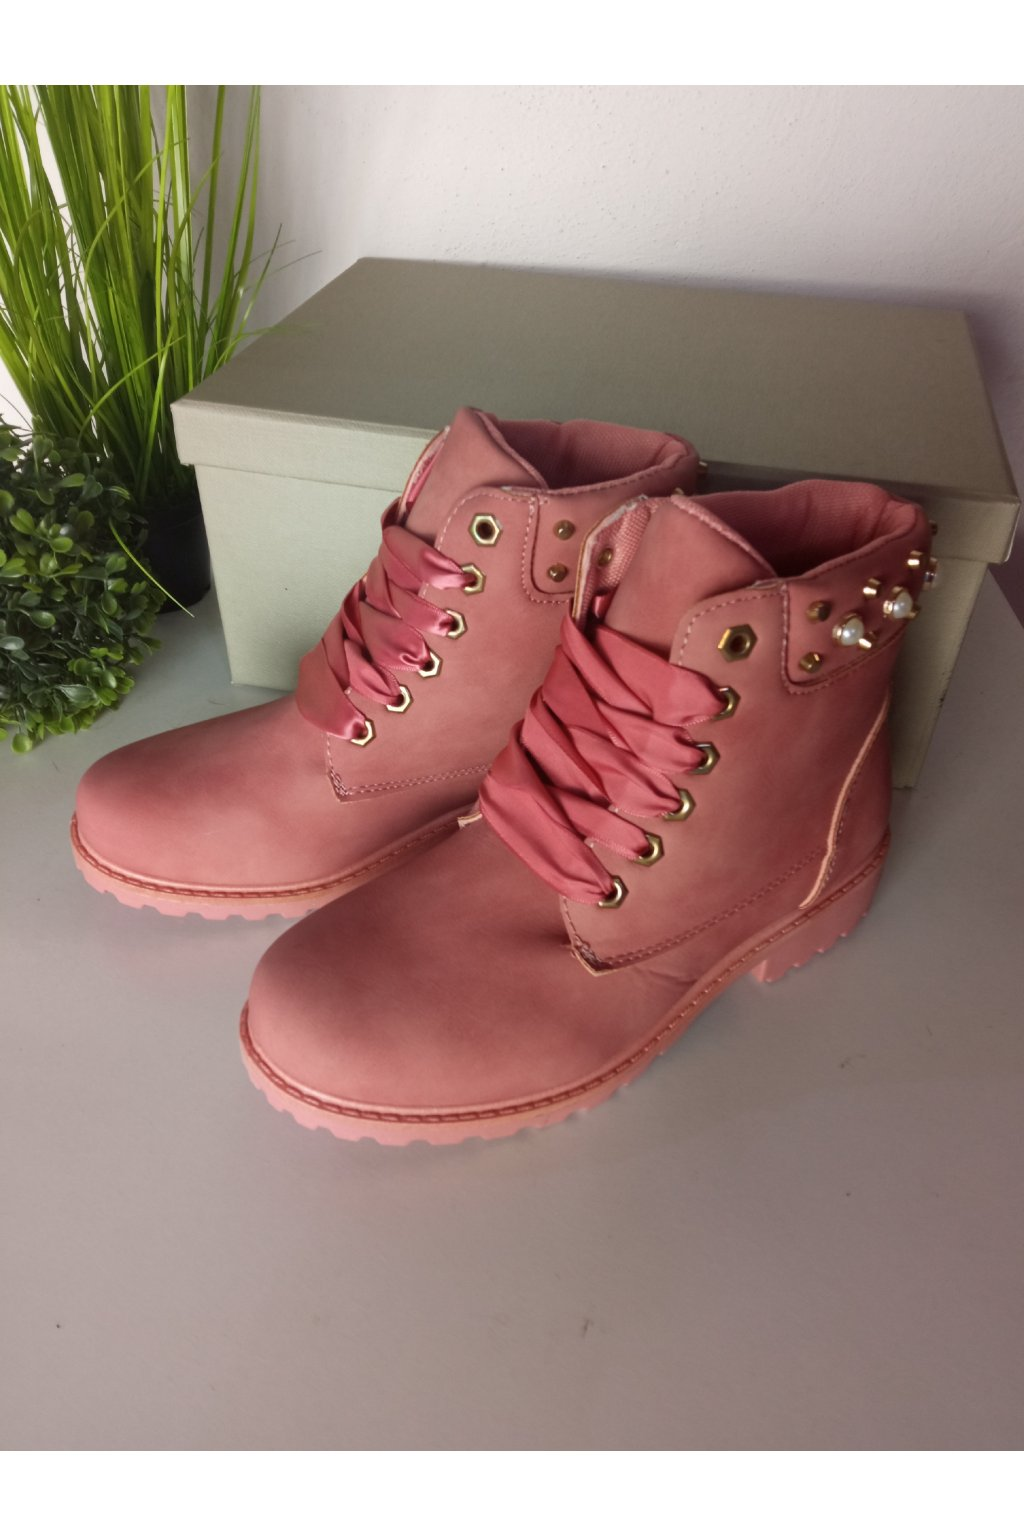 Ružové traperky NJSK DTR604/18P